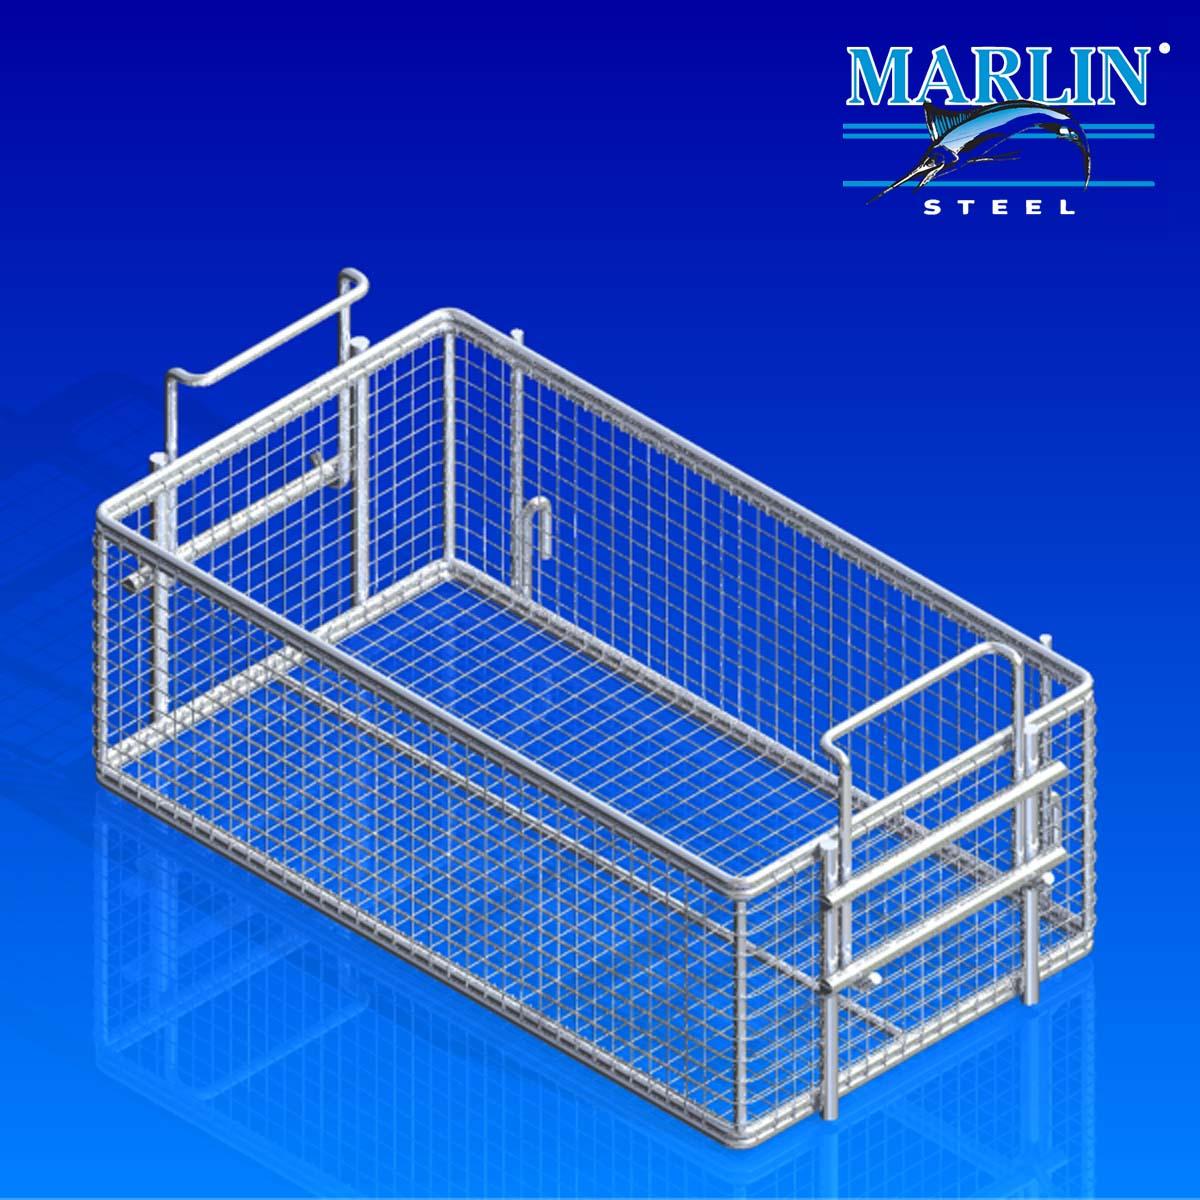 Marlin Steel Basket with Handles 280001